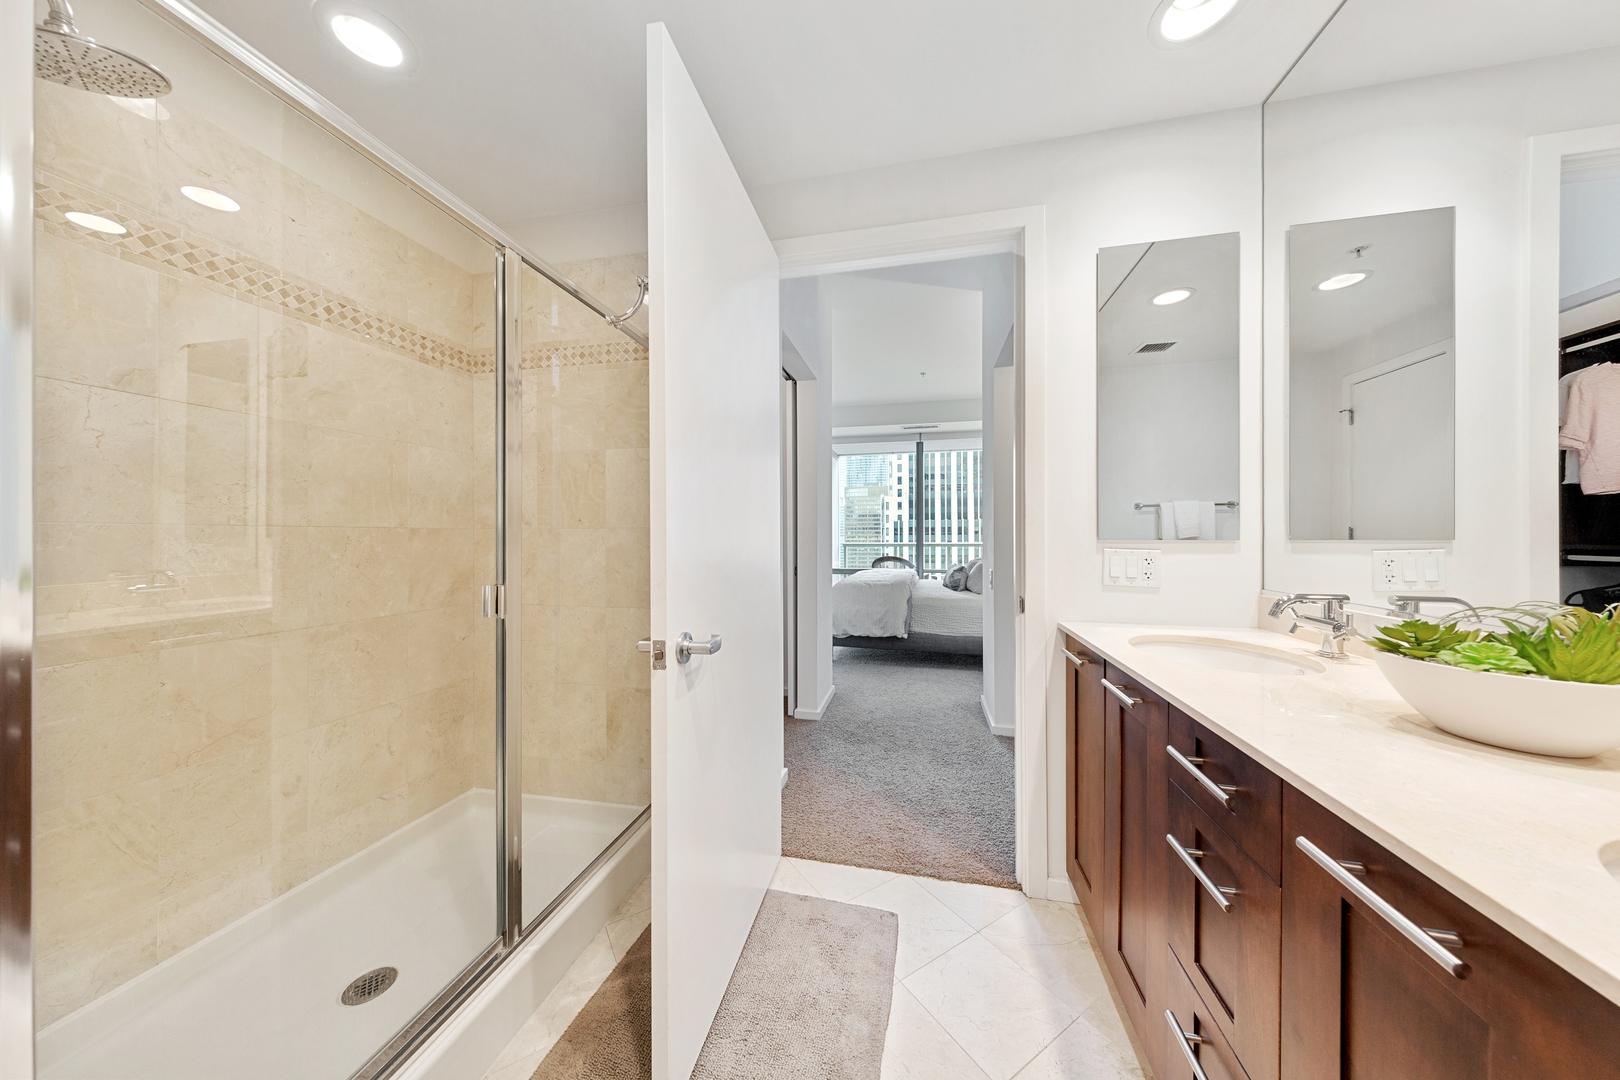 240 Illinois Street, Chicago, Illinois 60611, 2 Bedrooms Bedrooms, ,2 BathroomsBathrooms,Residential,For Sale,Illinois,MRD11156631